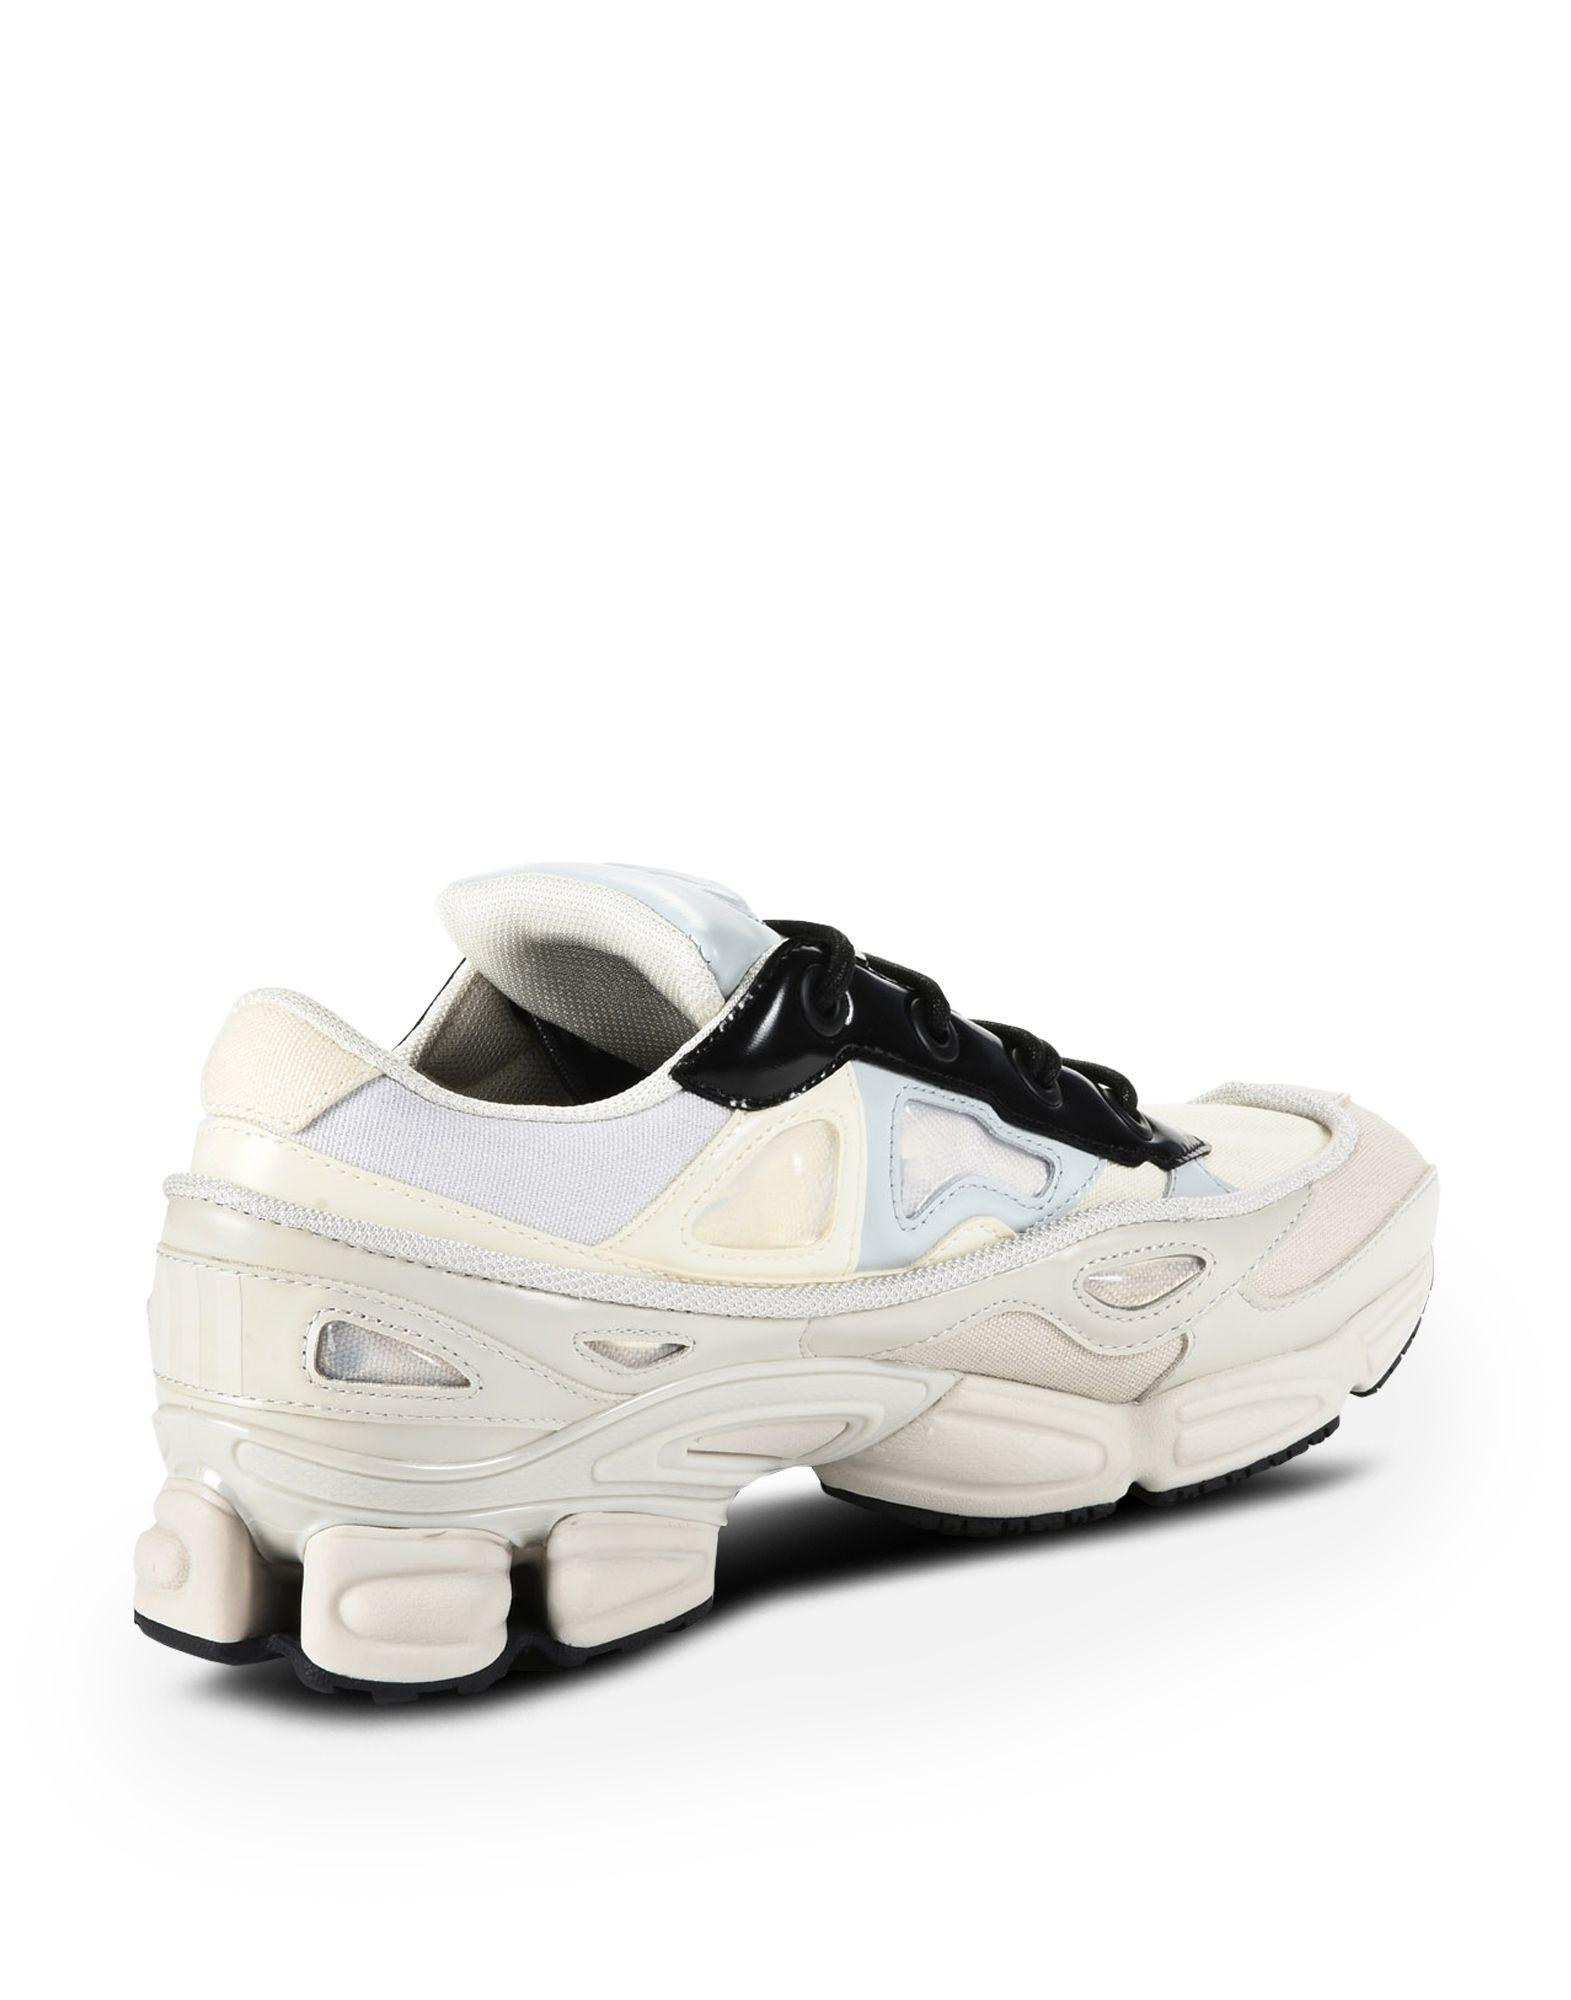 adidas   Raf simons sneakers, Sneakers